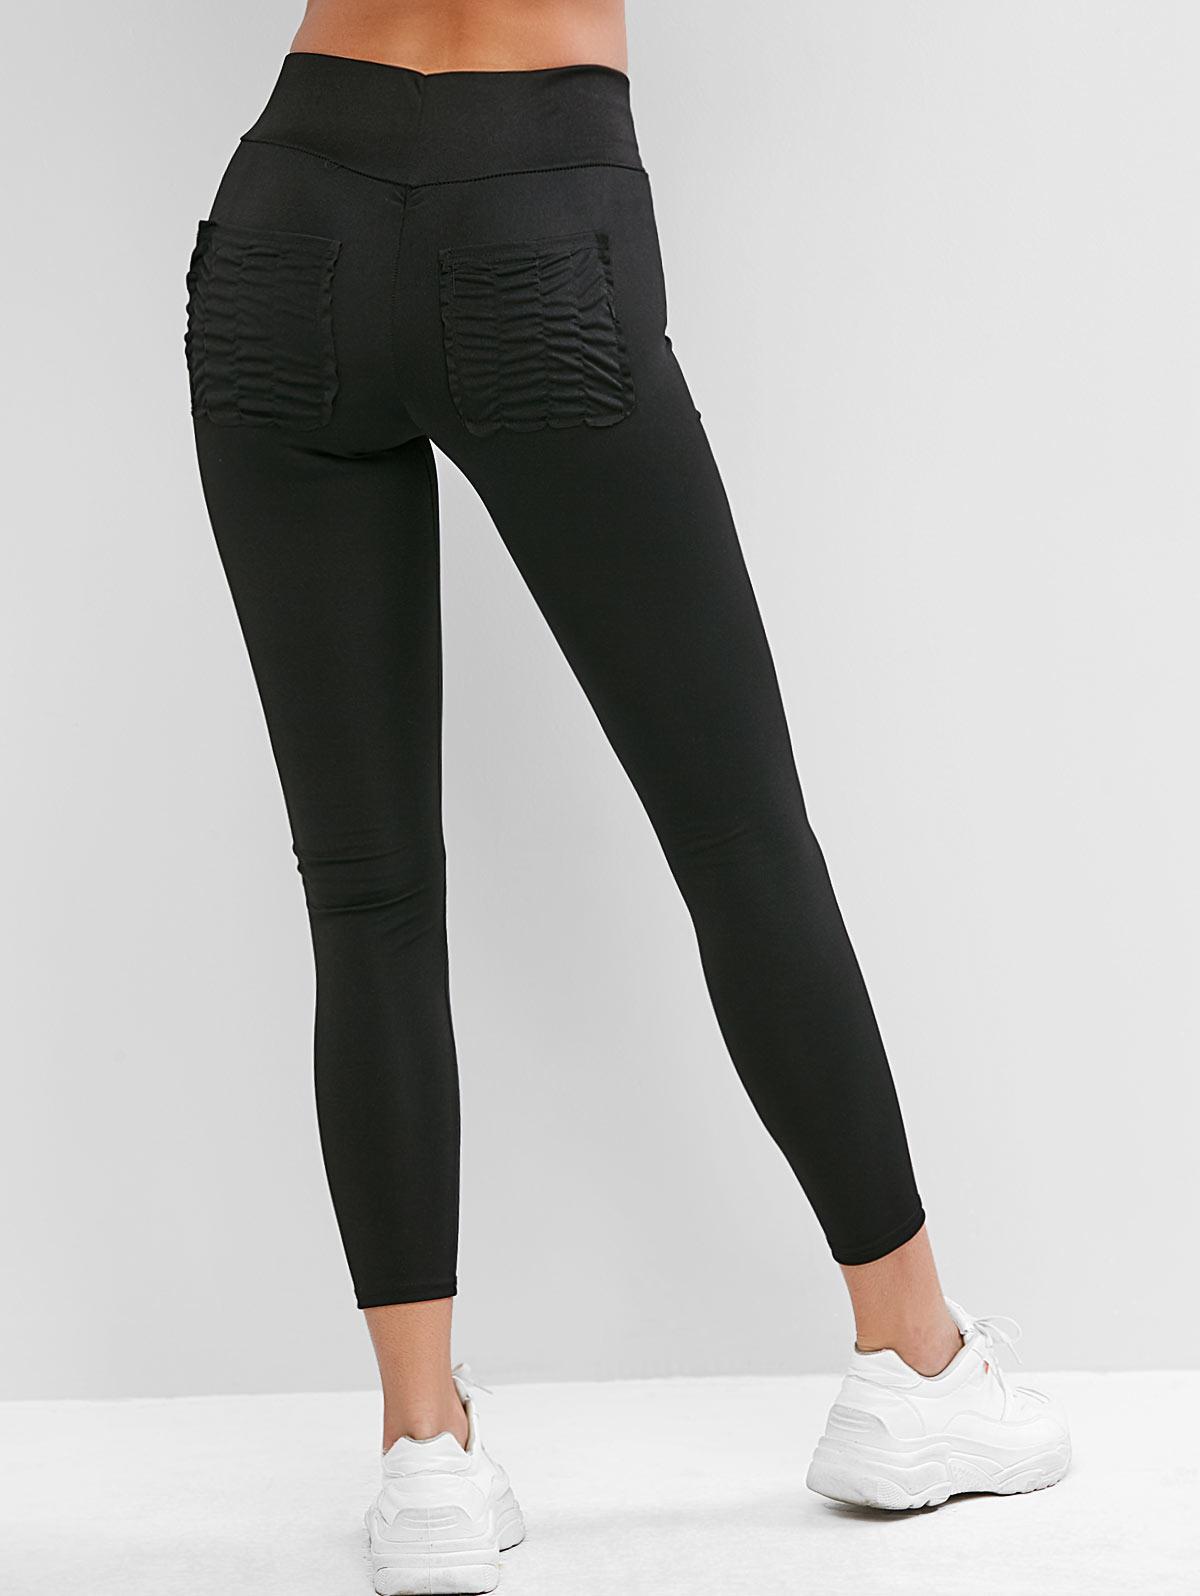 High Waisted Ruched Back Pockets Leggings, Black